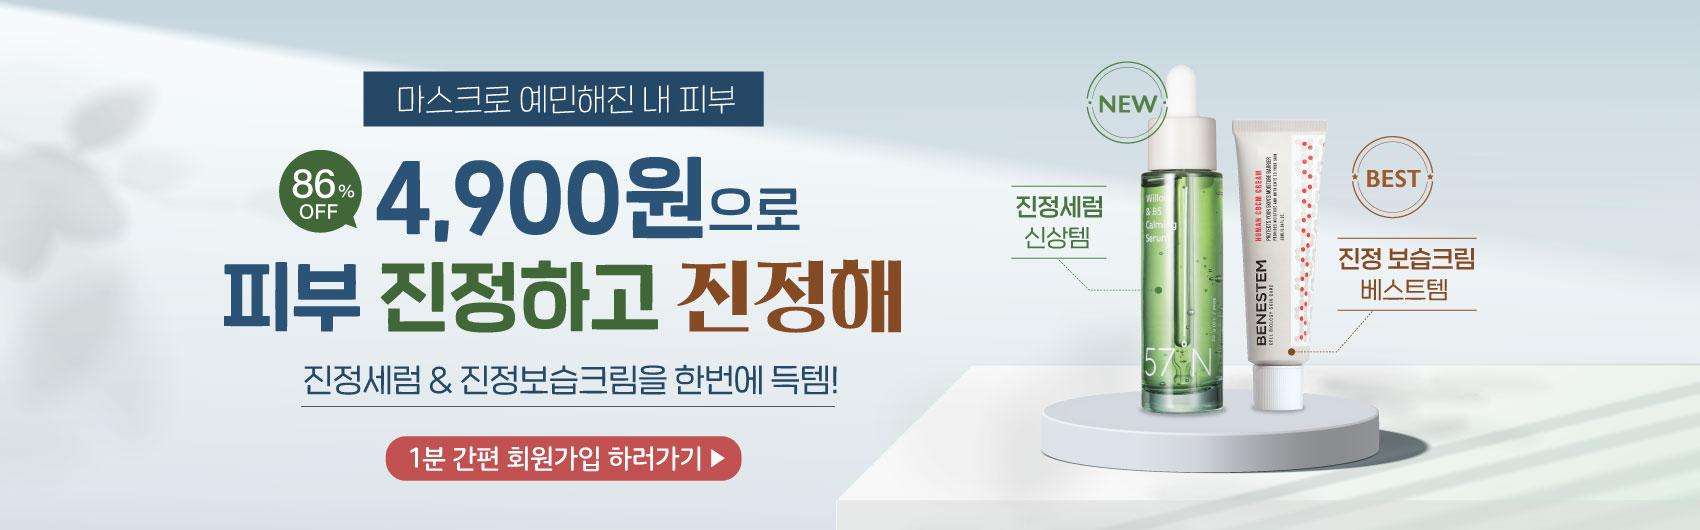 Kakao-Talk-20201016-101858609.jpg